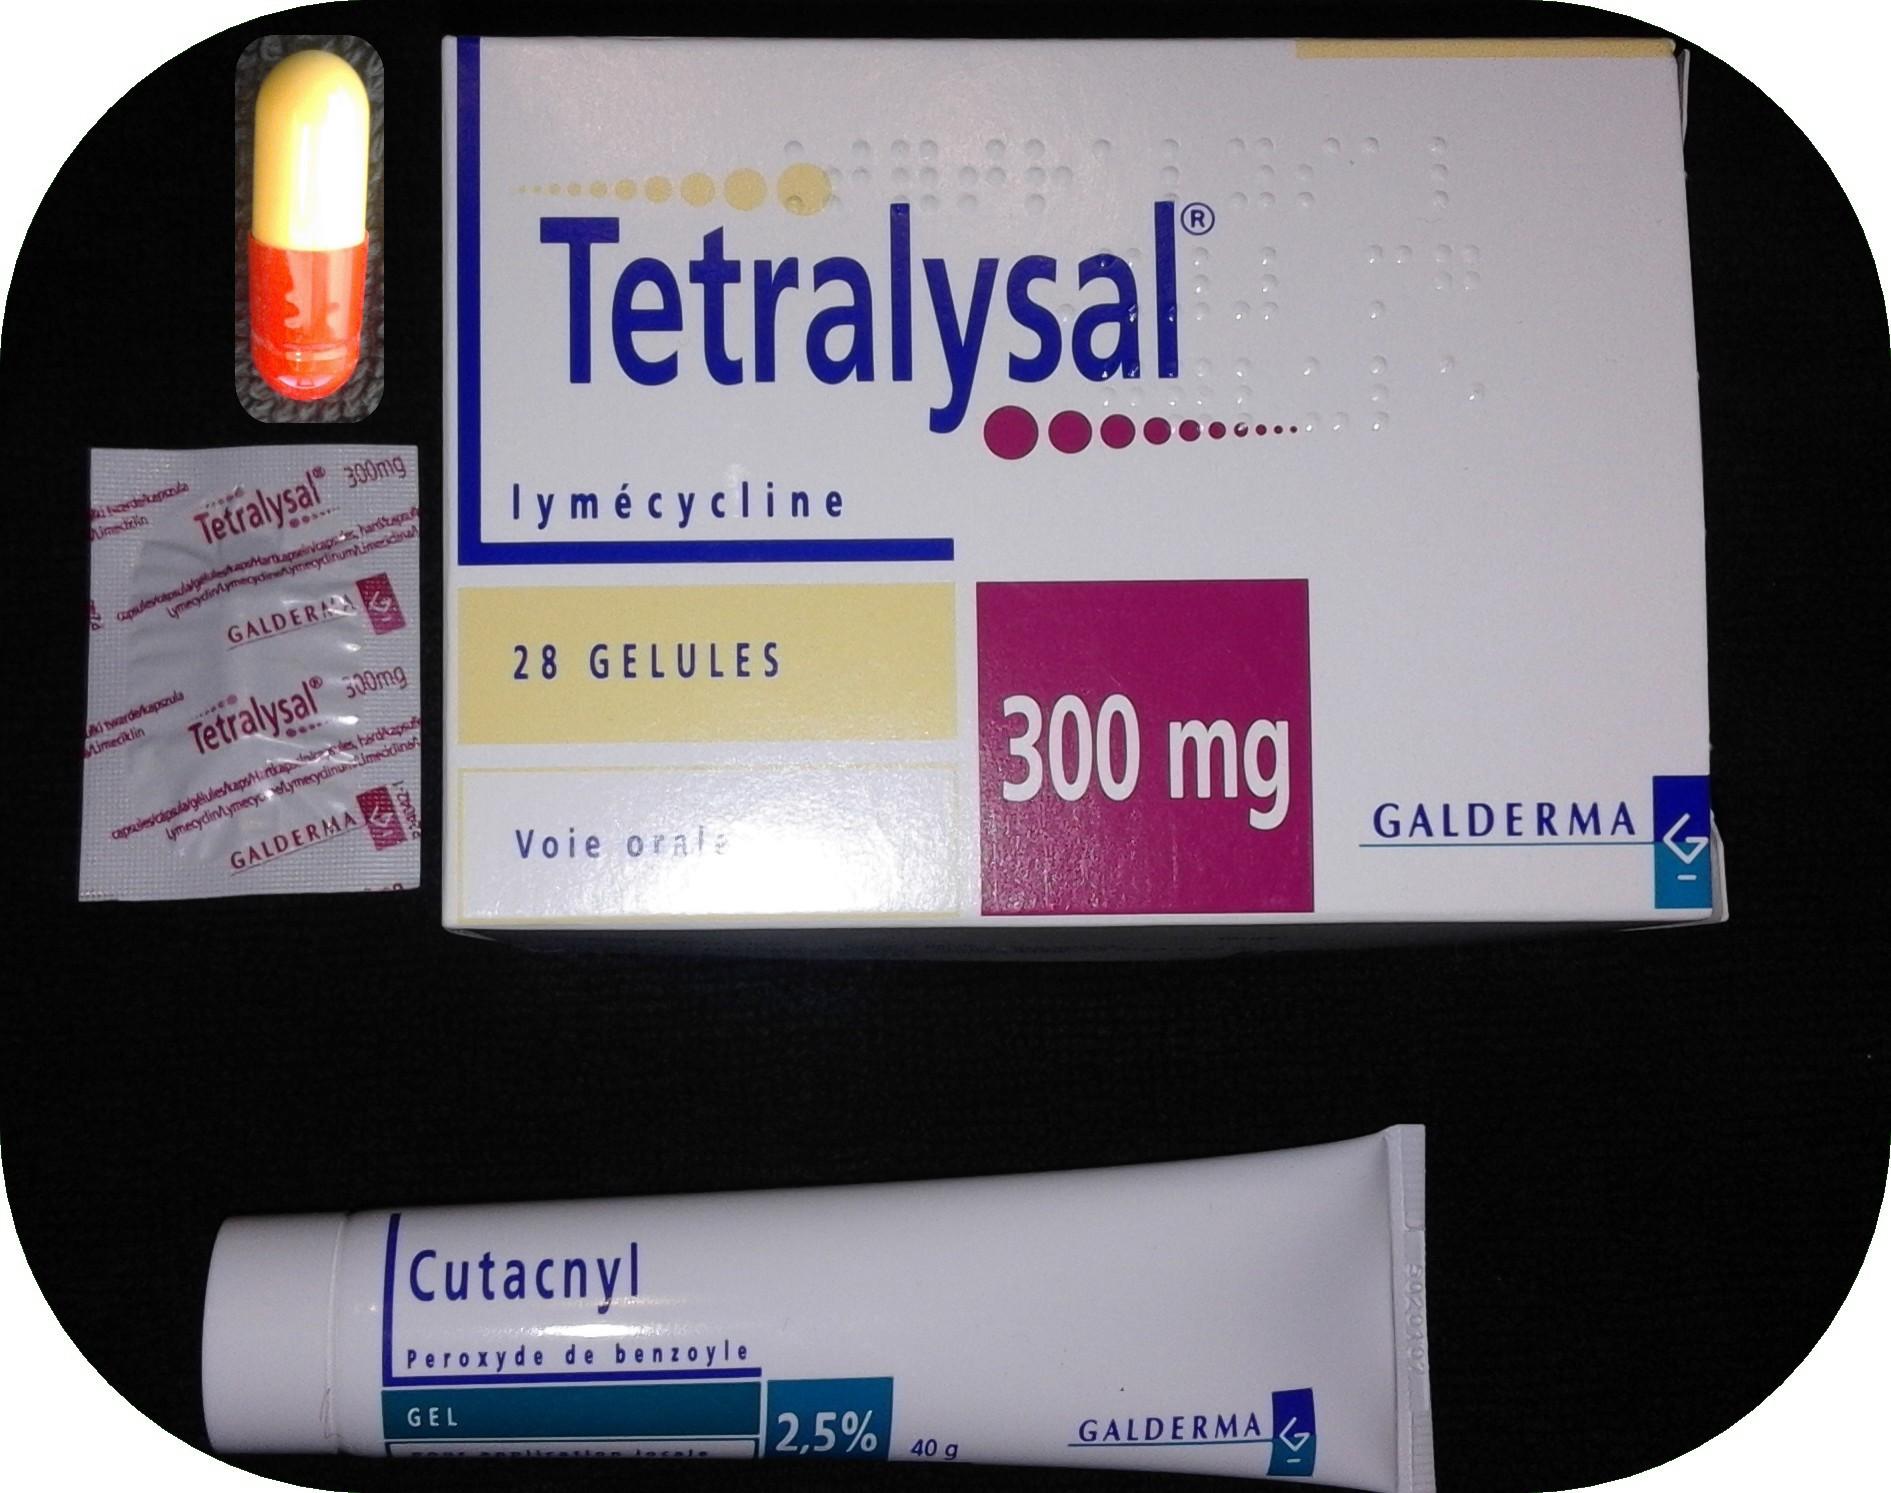 Tétralysal 300mg - Cutacnyl 2,5% - Regal album - Regal38